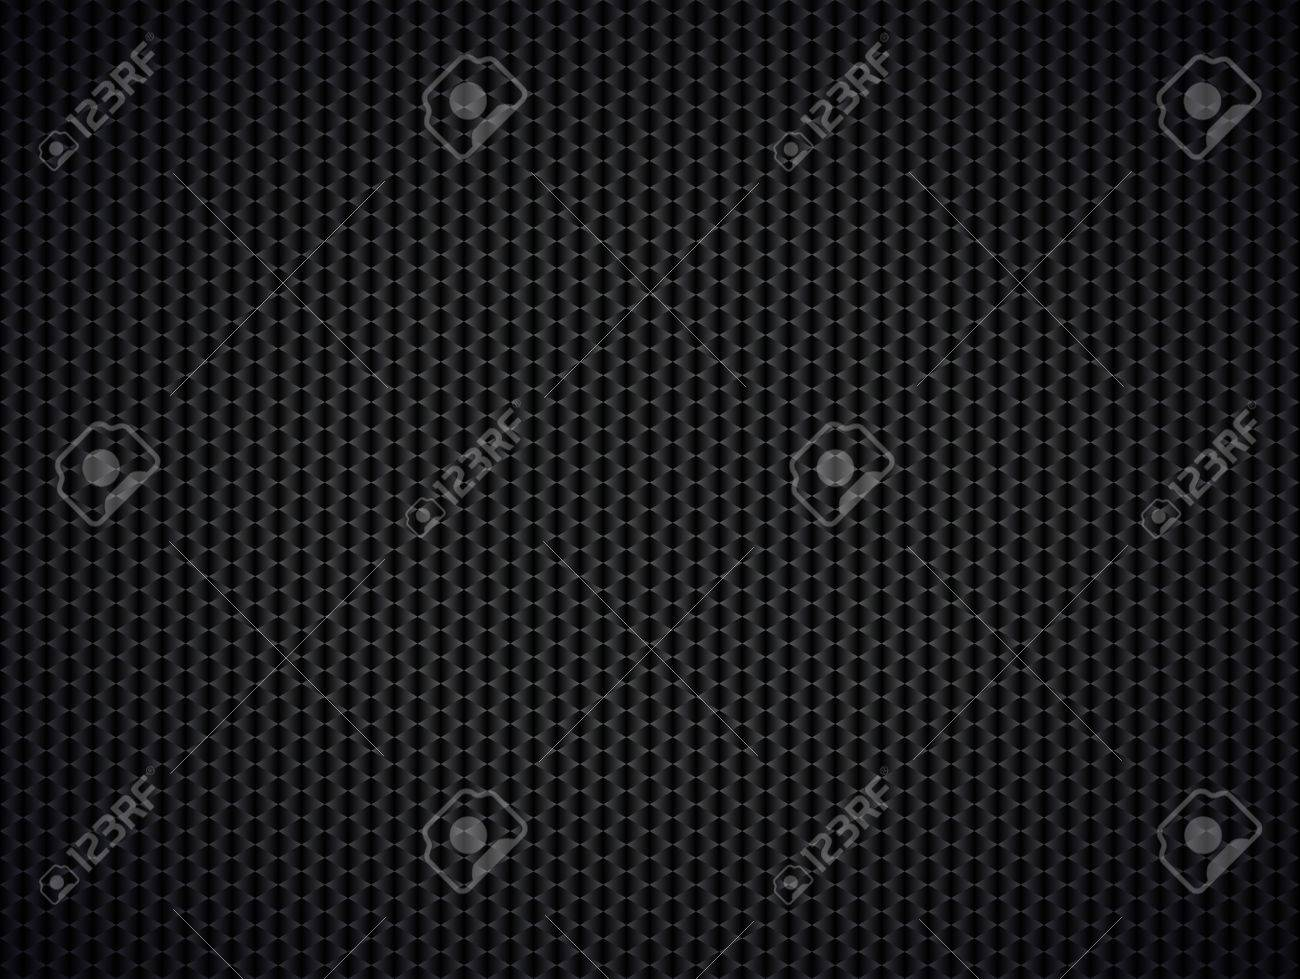 Abstract Metallic Black Background Illustration Stock Vector